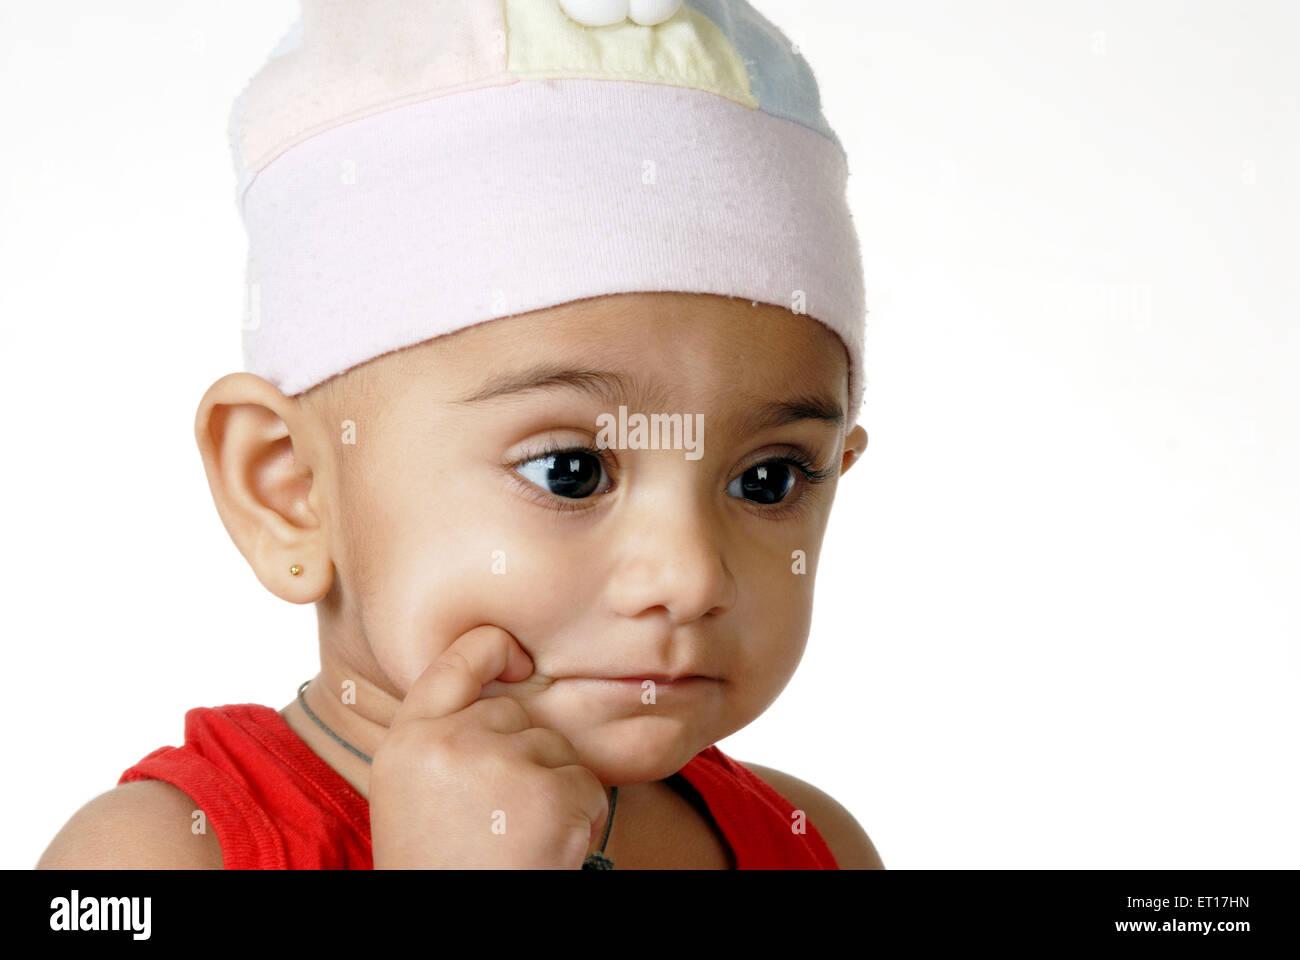 Baby boy thinking , finger on cheeks MR#512 - Stock Image